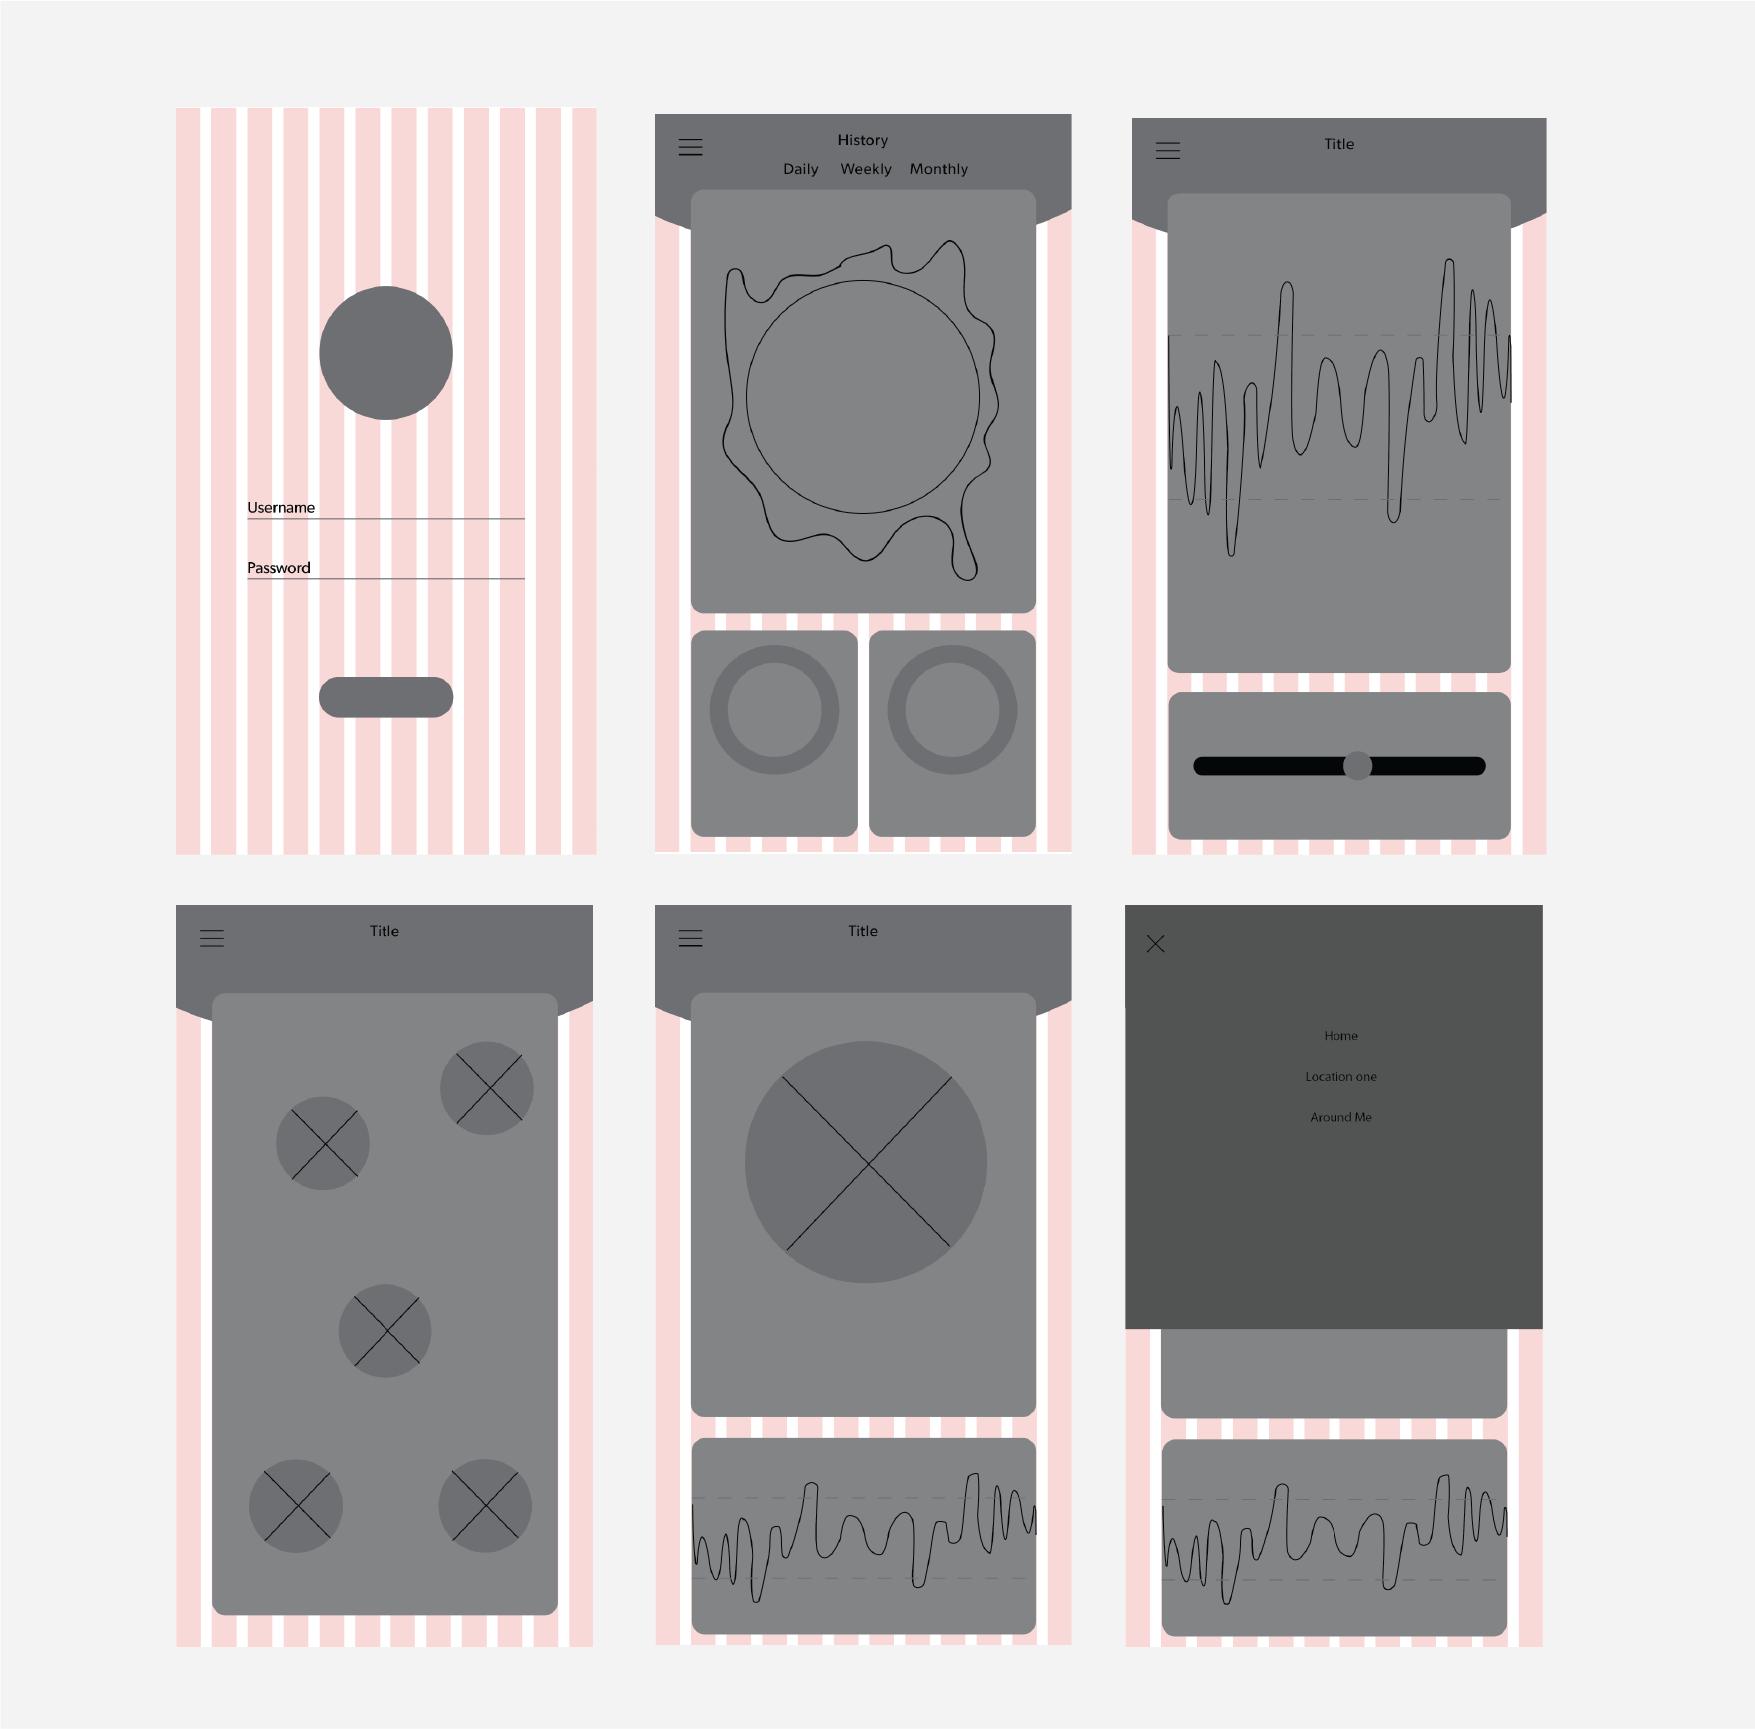 smartear-sketches-03.png